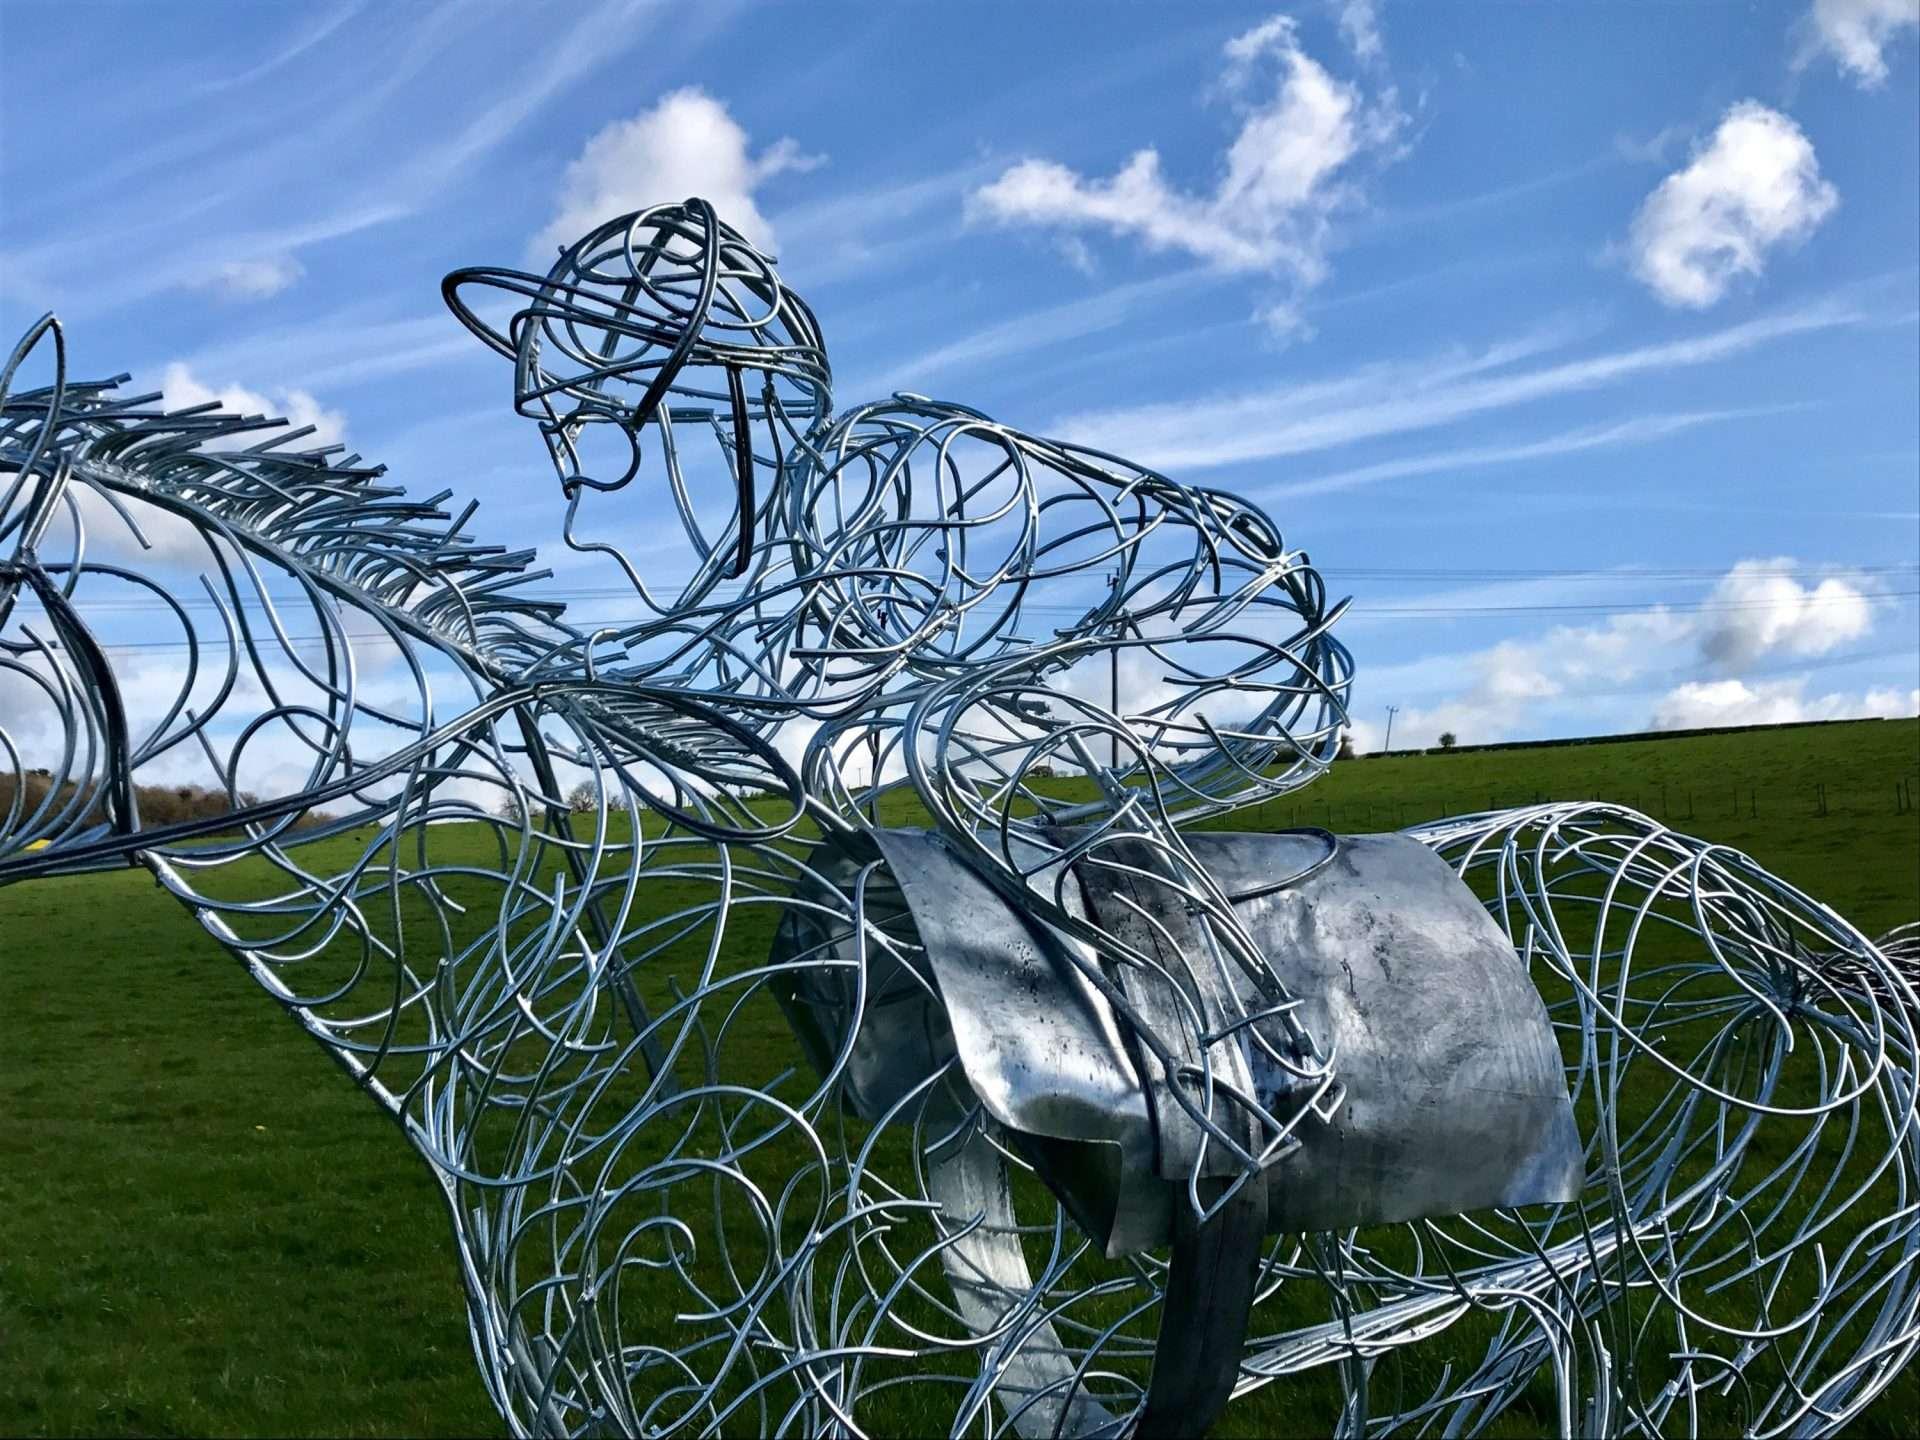 Horse and Jokey Riding Sculpture Image Of Jokey